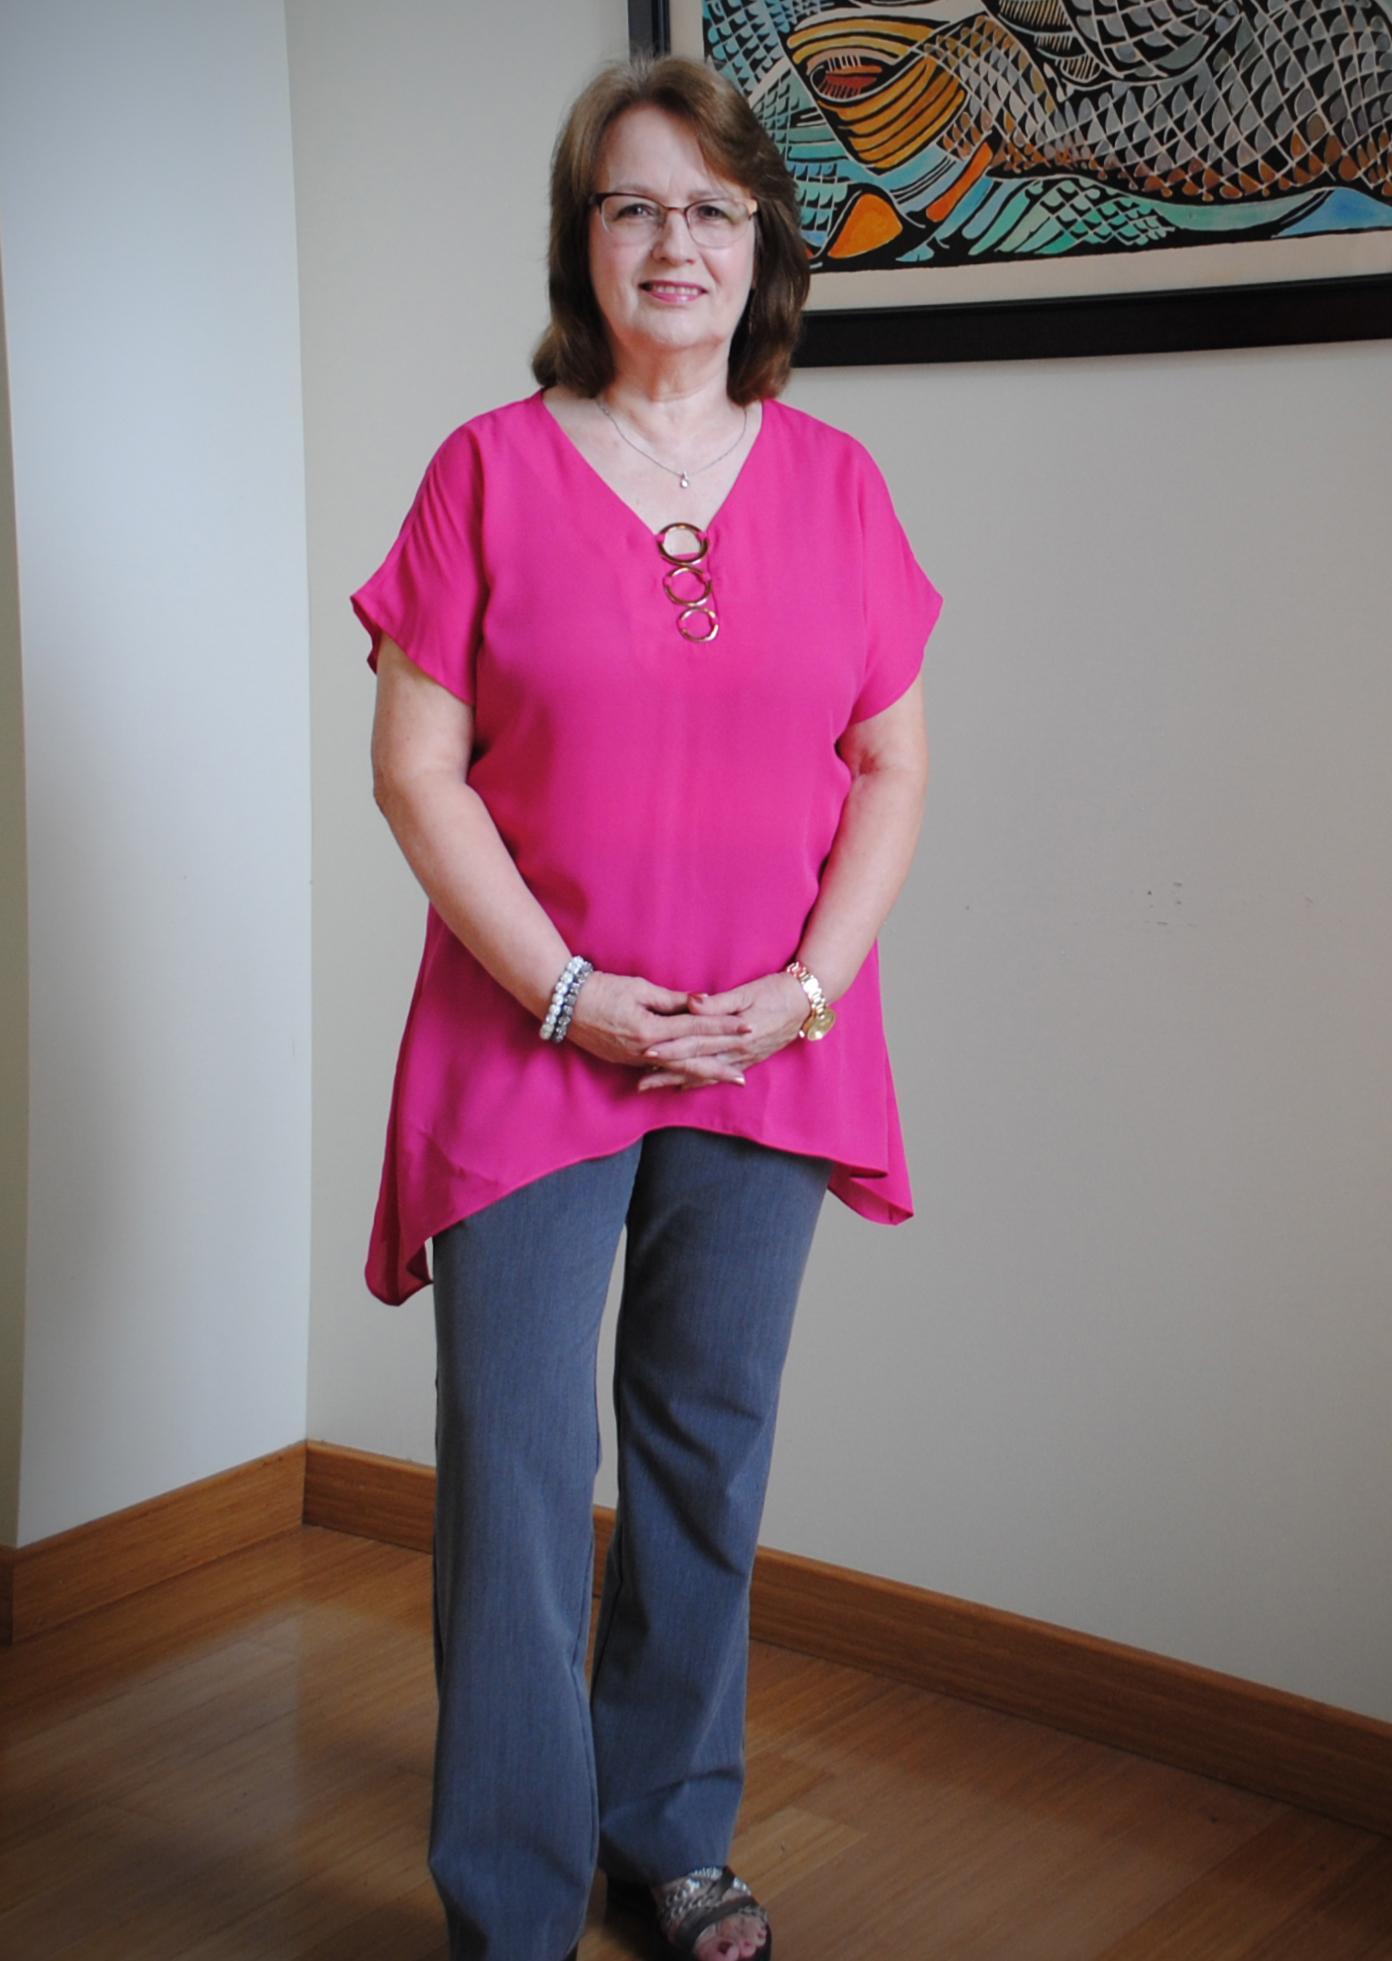 Gayle Shultz, CN Director